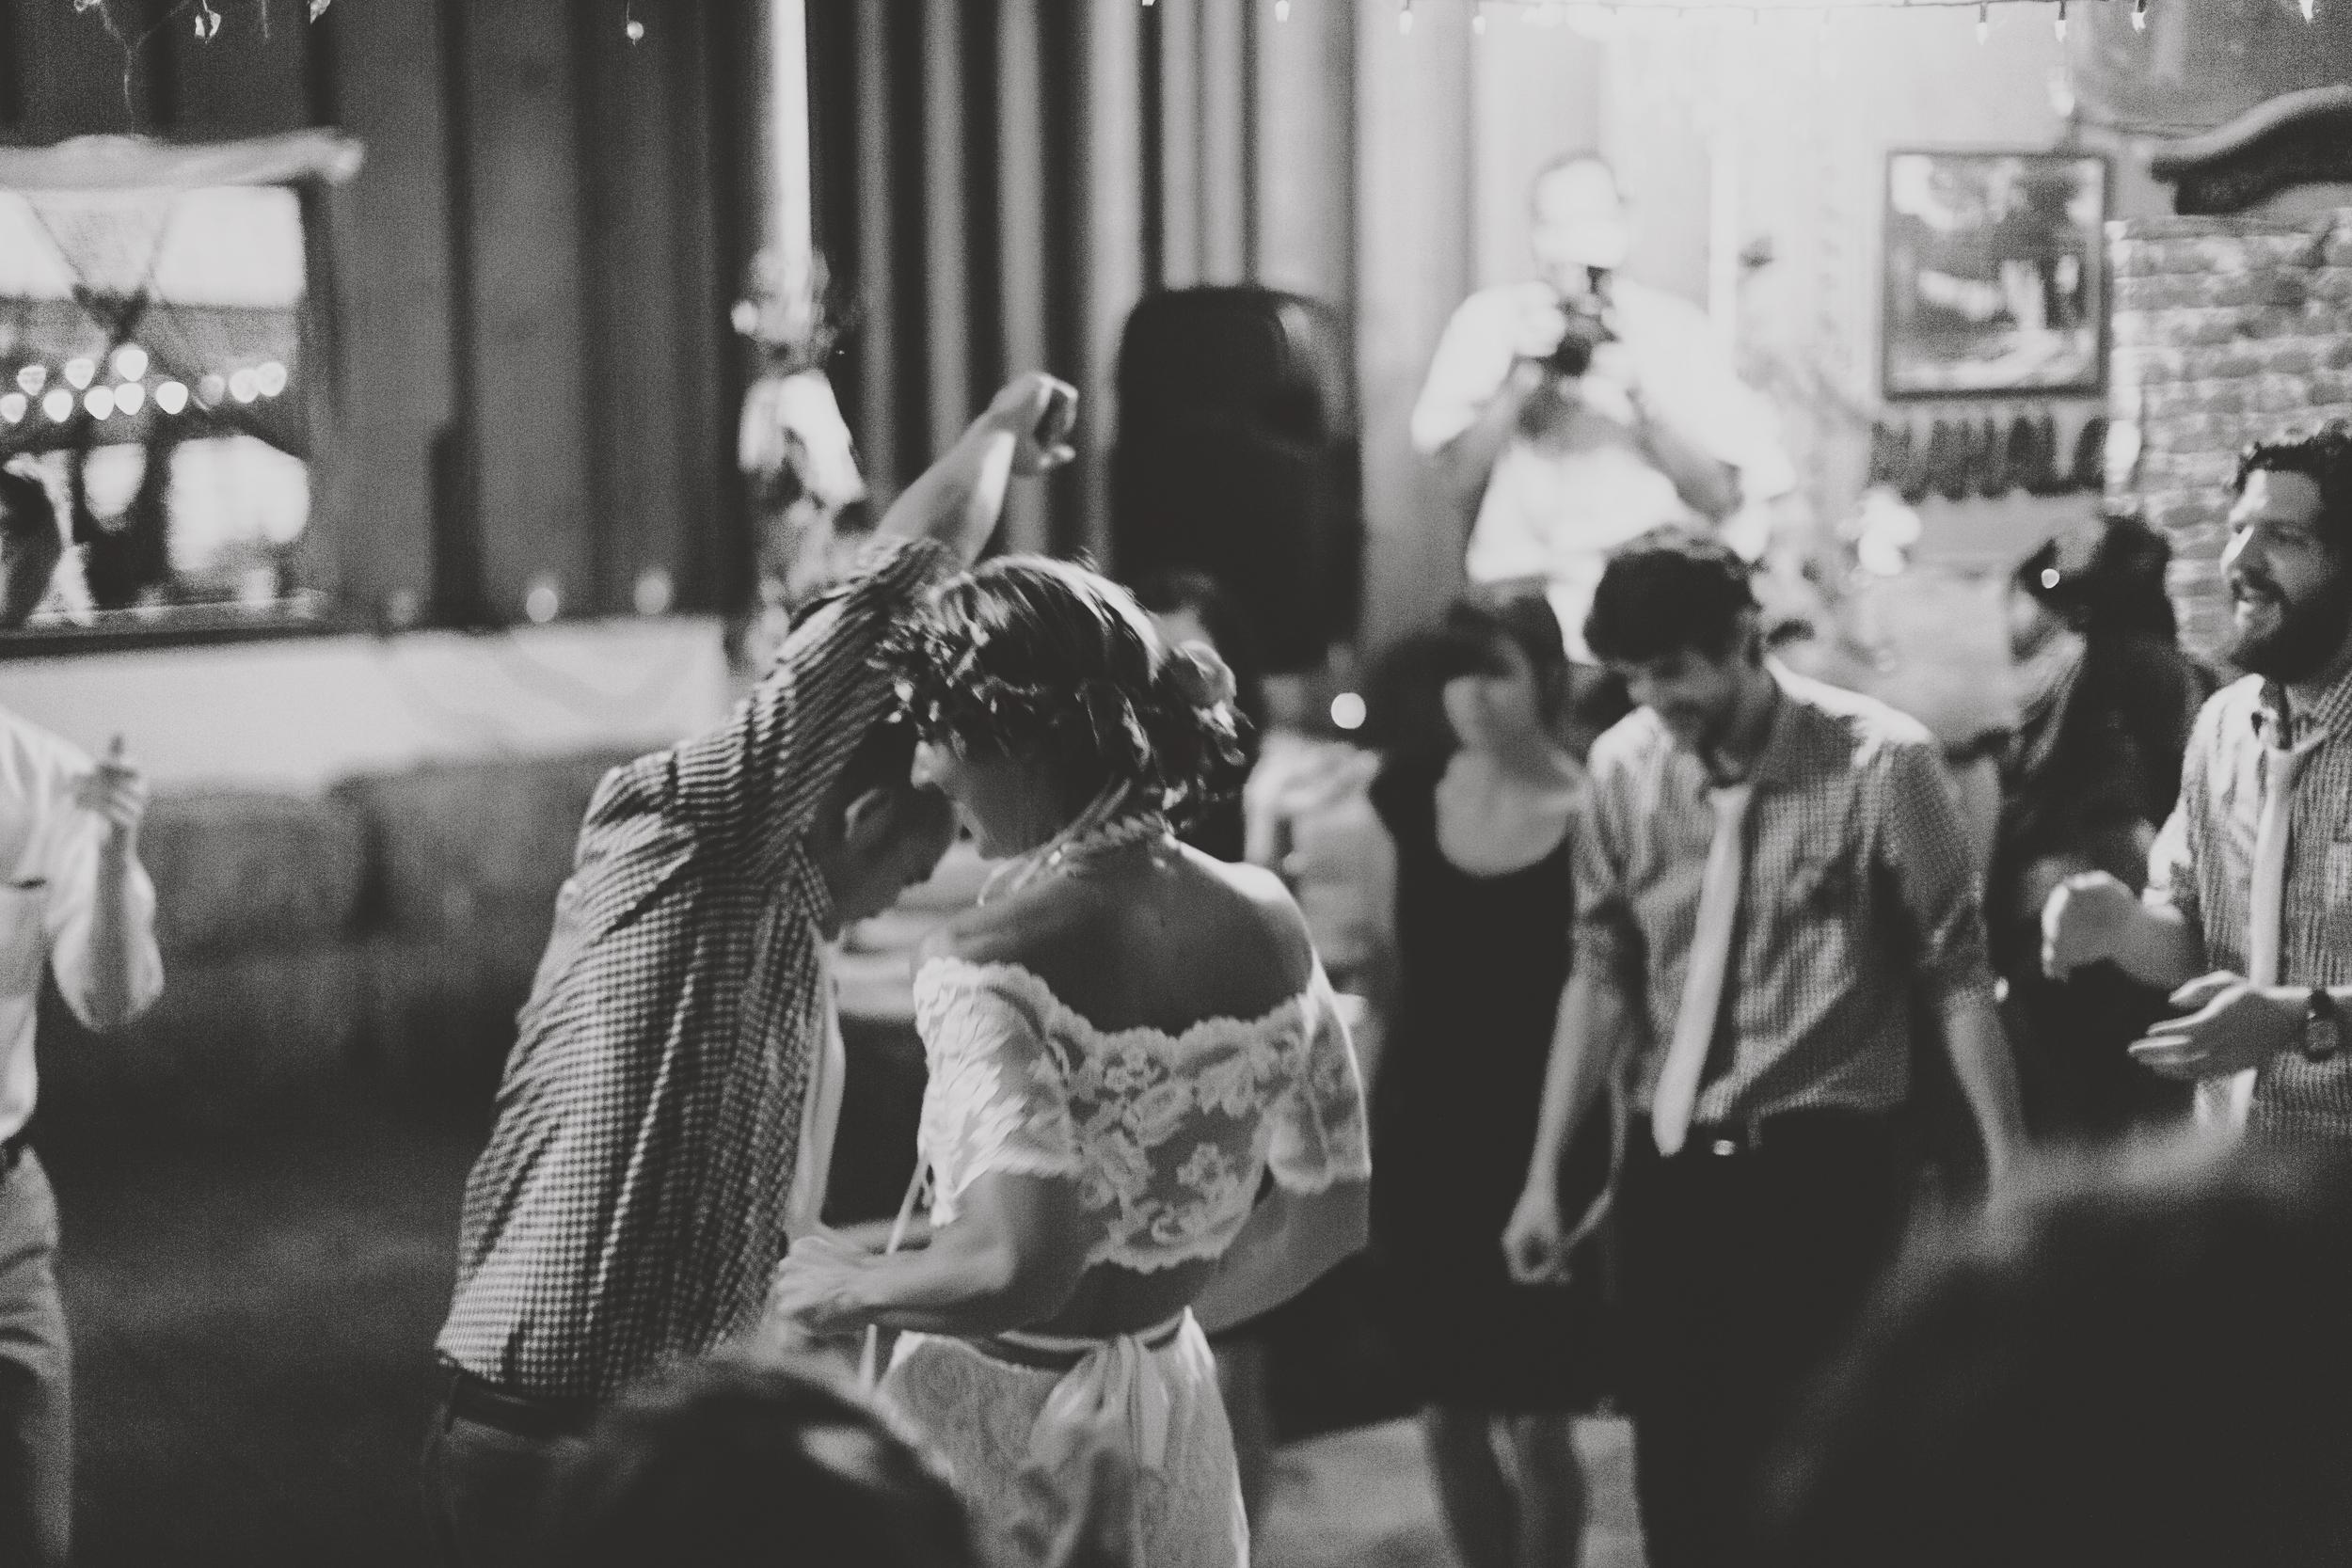 angie-diaz-photography-oahu-hawaii-wedding-tradewinds-ranch-118.jpg